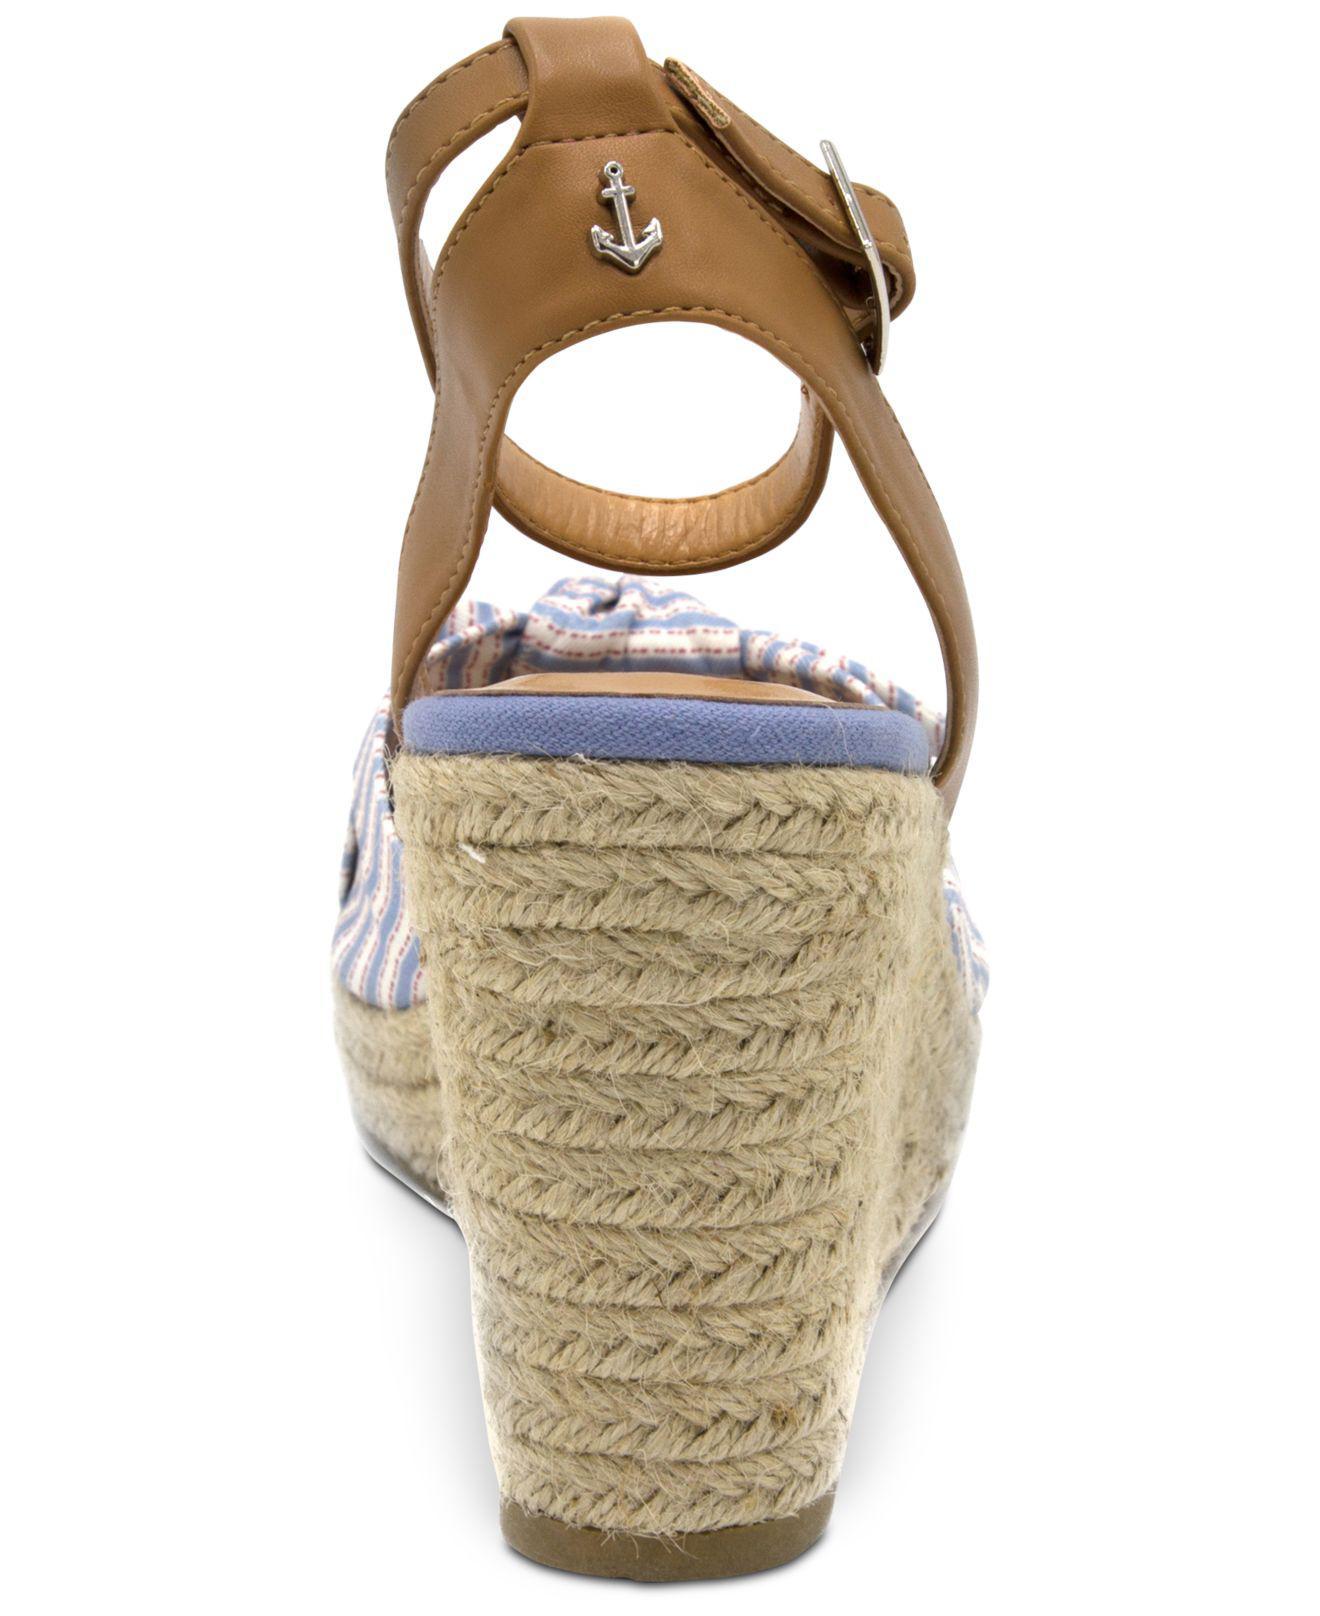 Nautica Curia Platform Espadrille Wedge Sandals Women's Shoes jYCE4b8